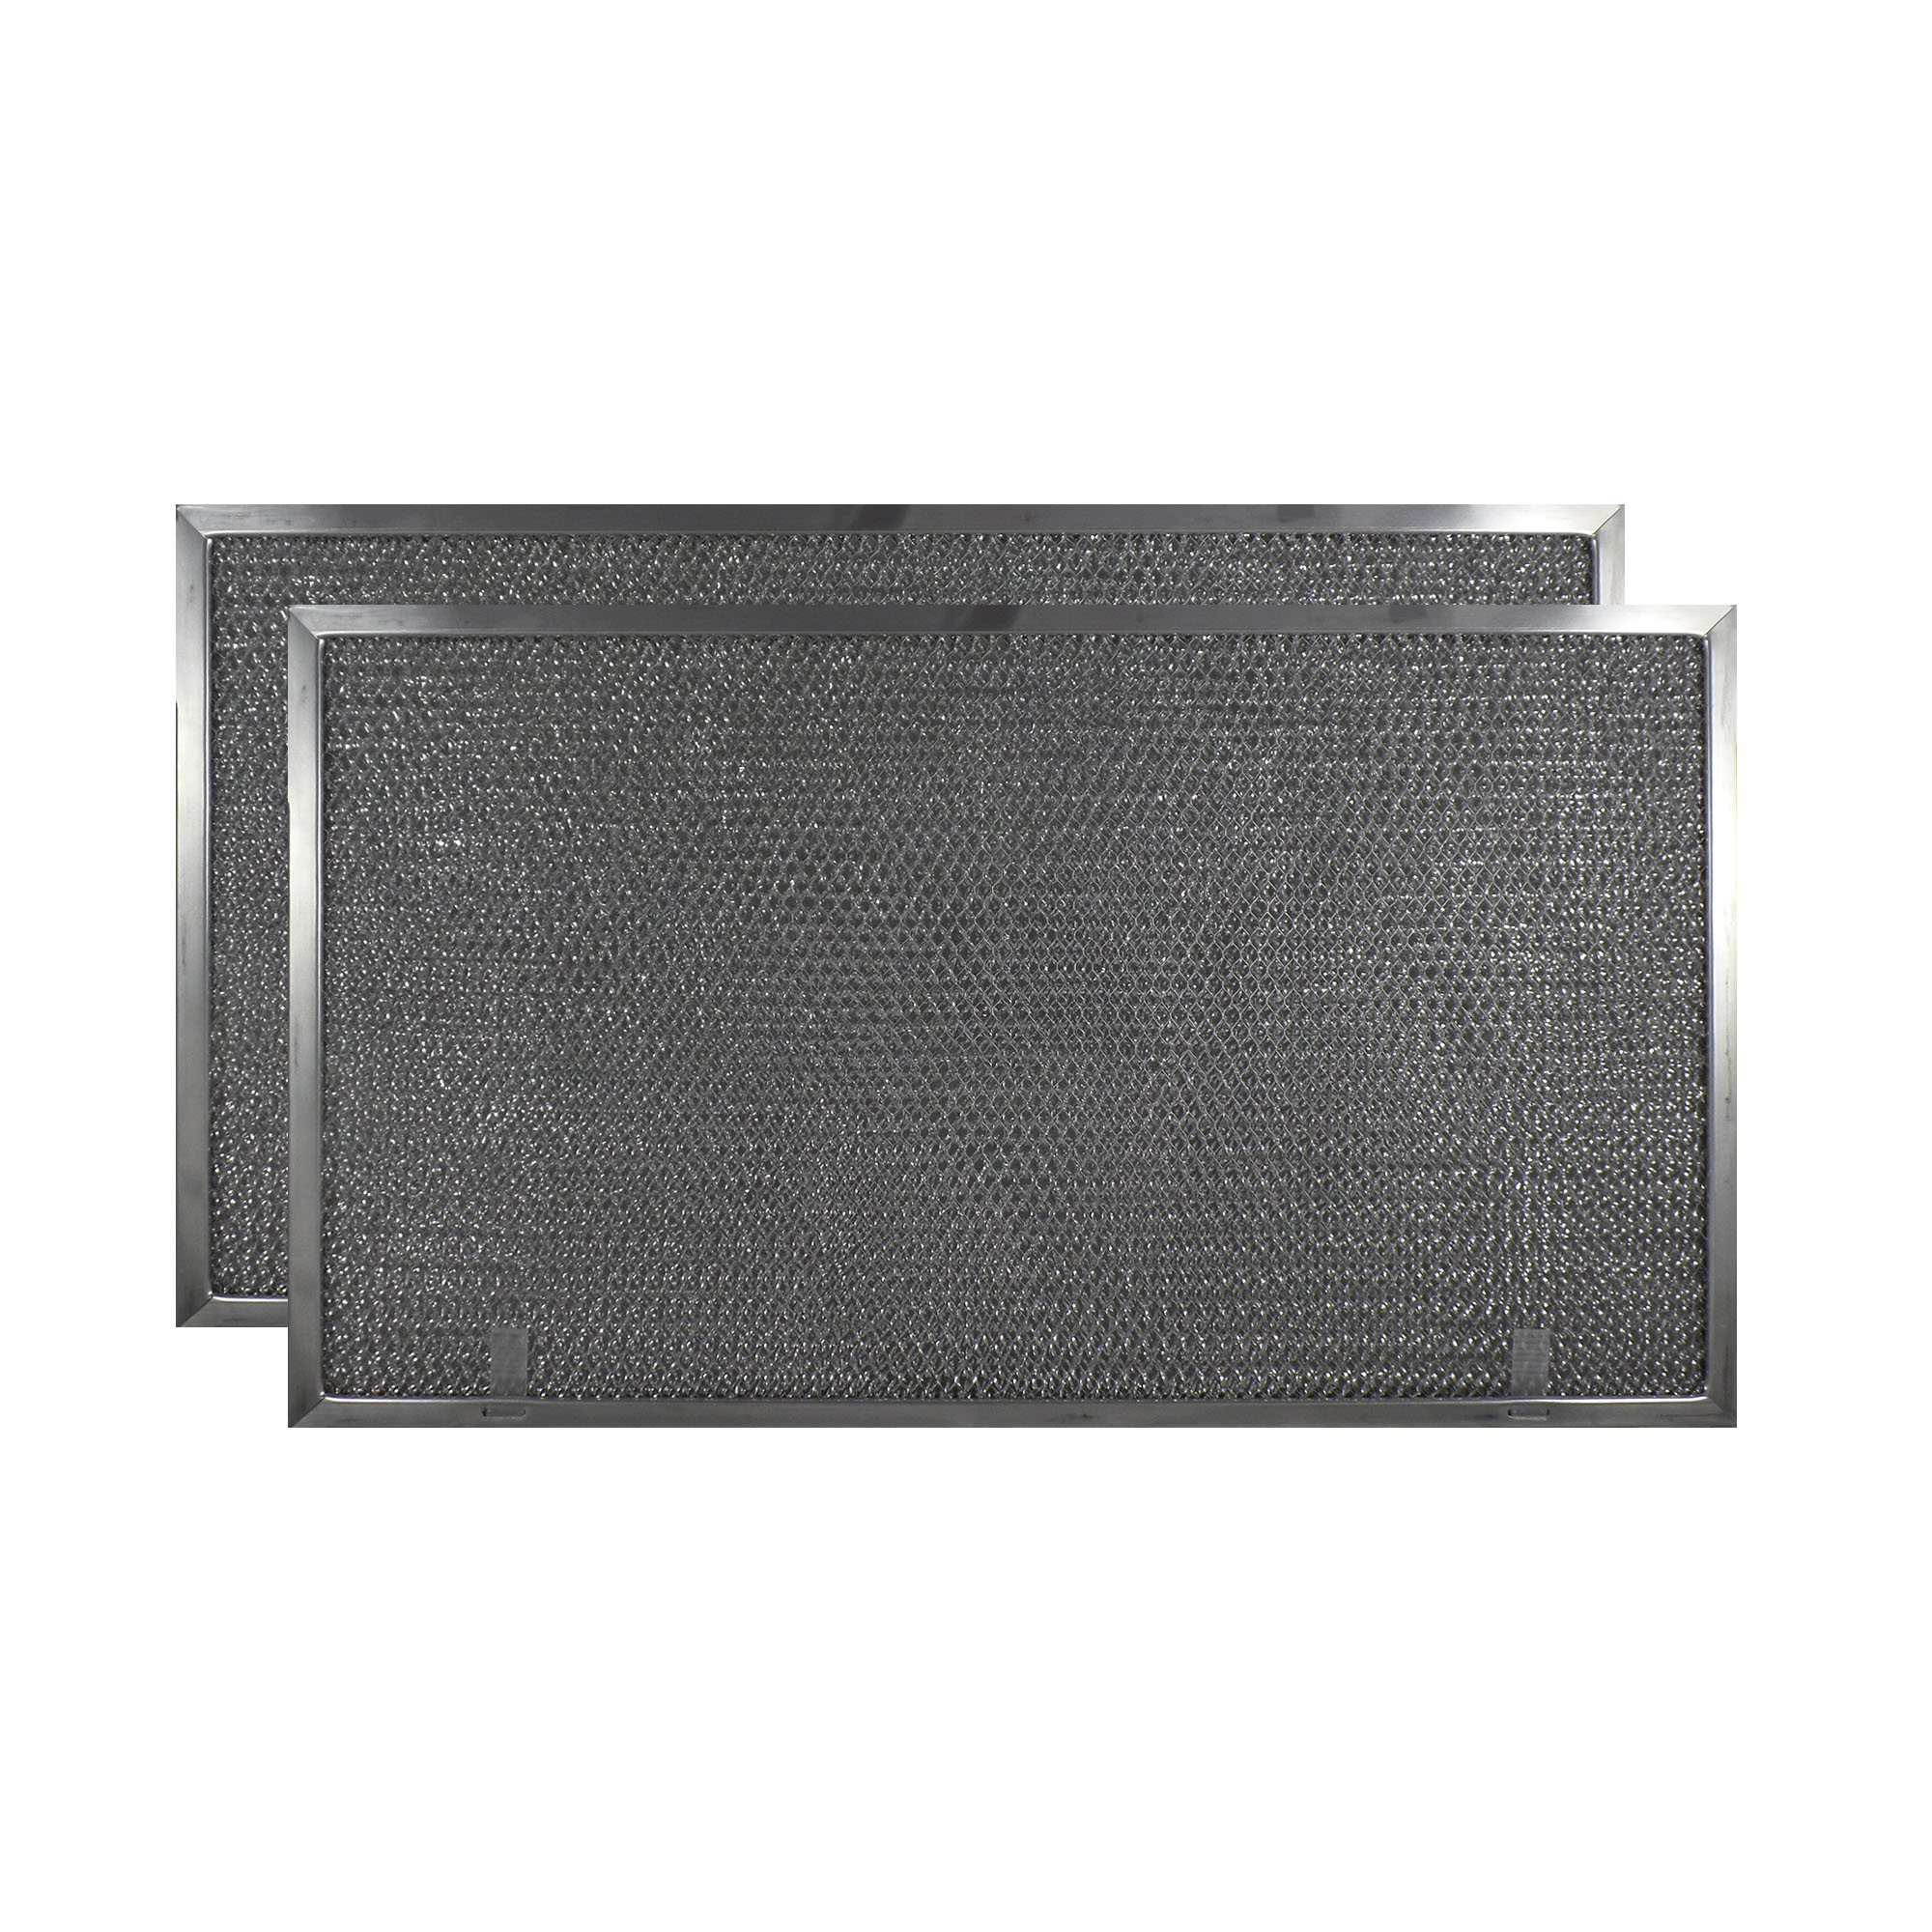 30-in 2-Pack Genuine Original Equipment Manufacturer OEM Part Broan 99010305 Range Hood Grease Filter